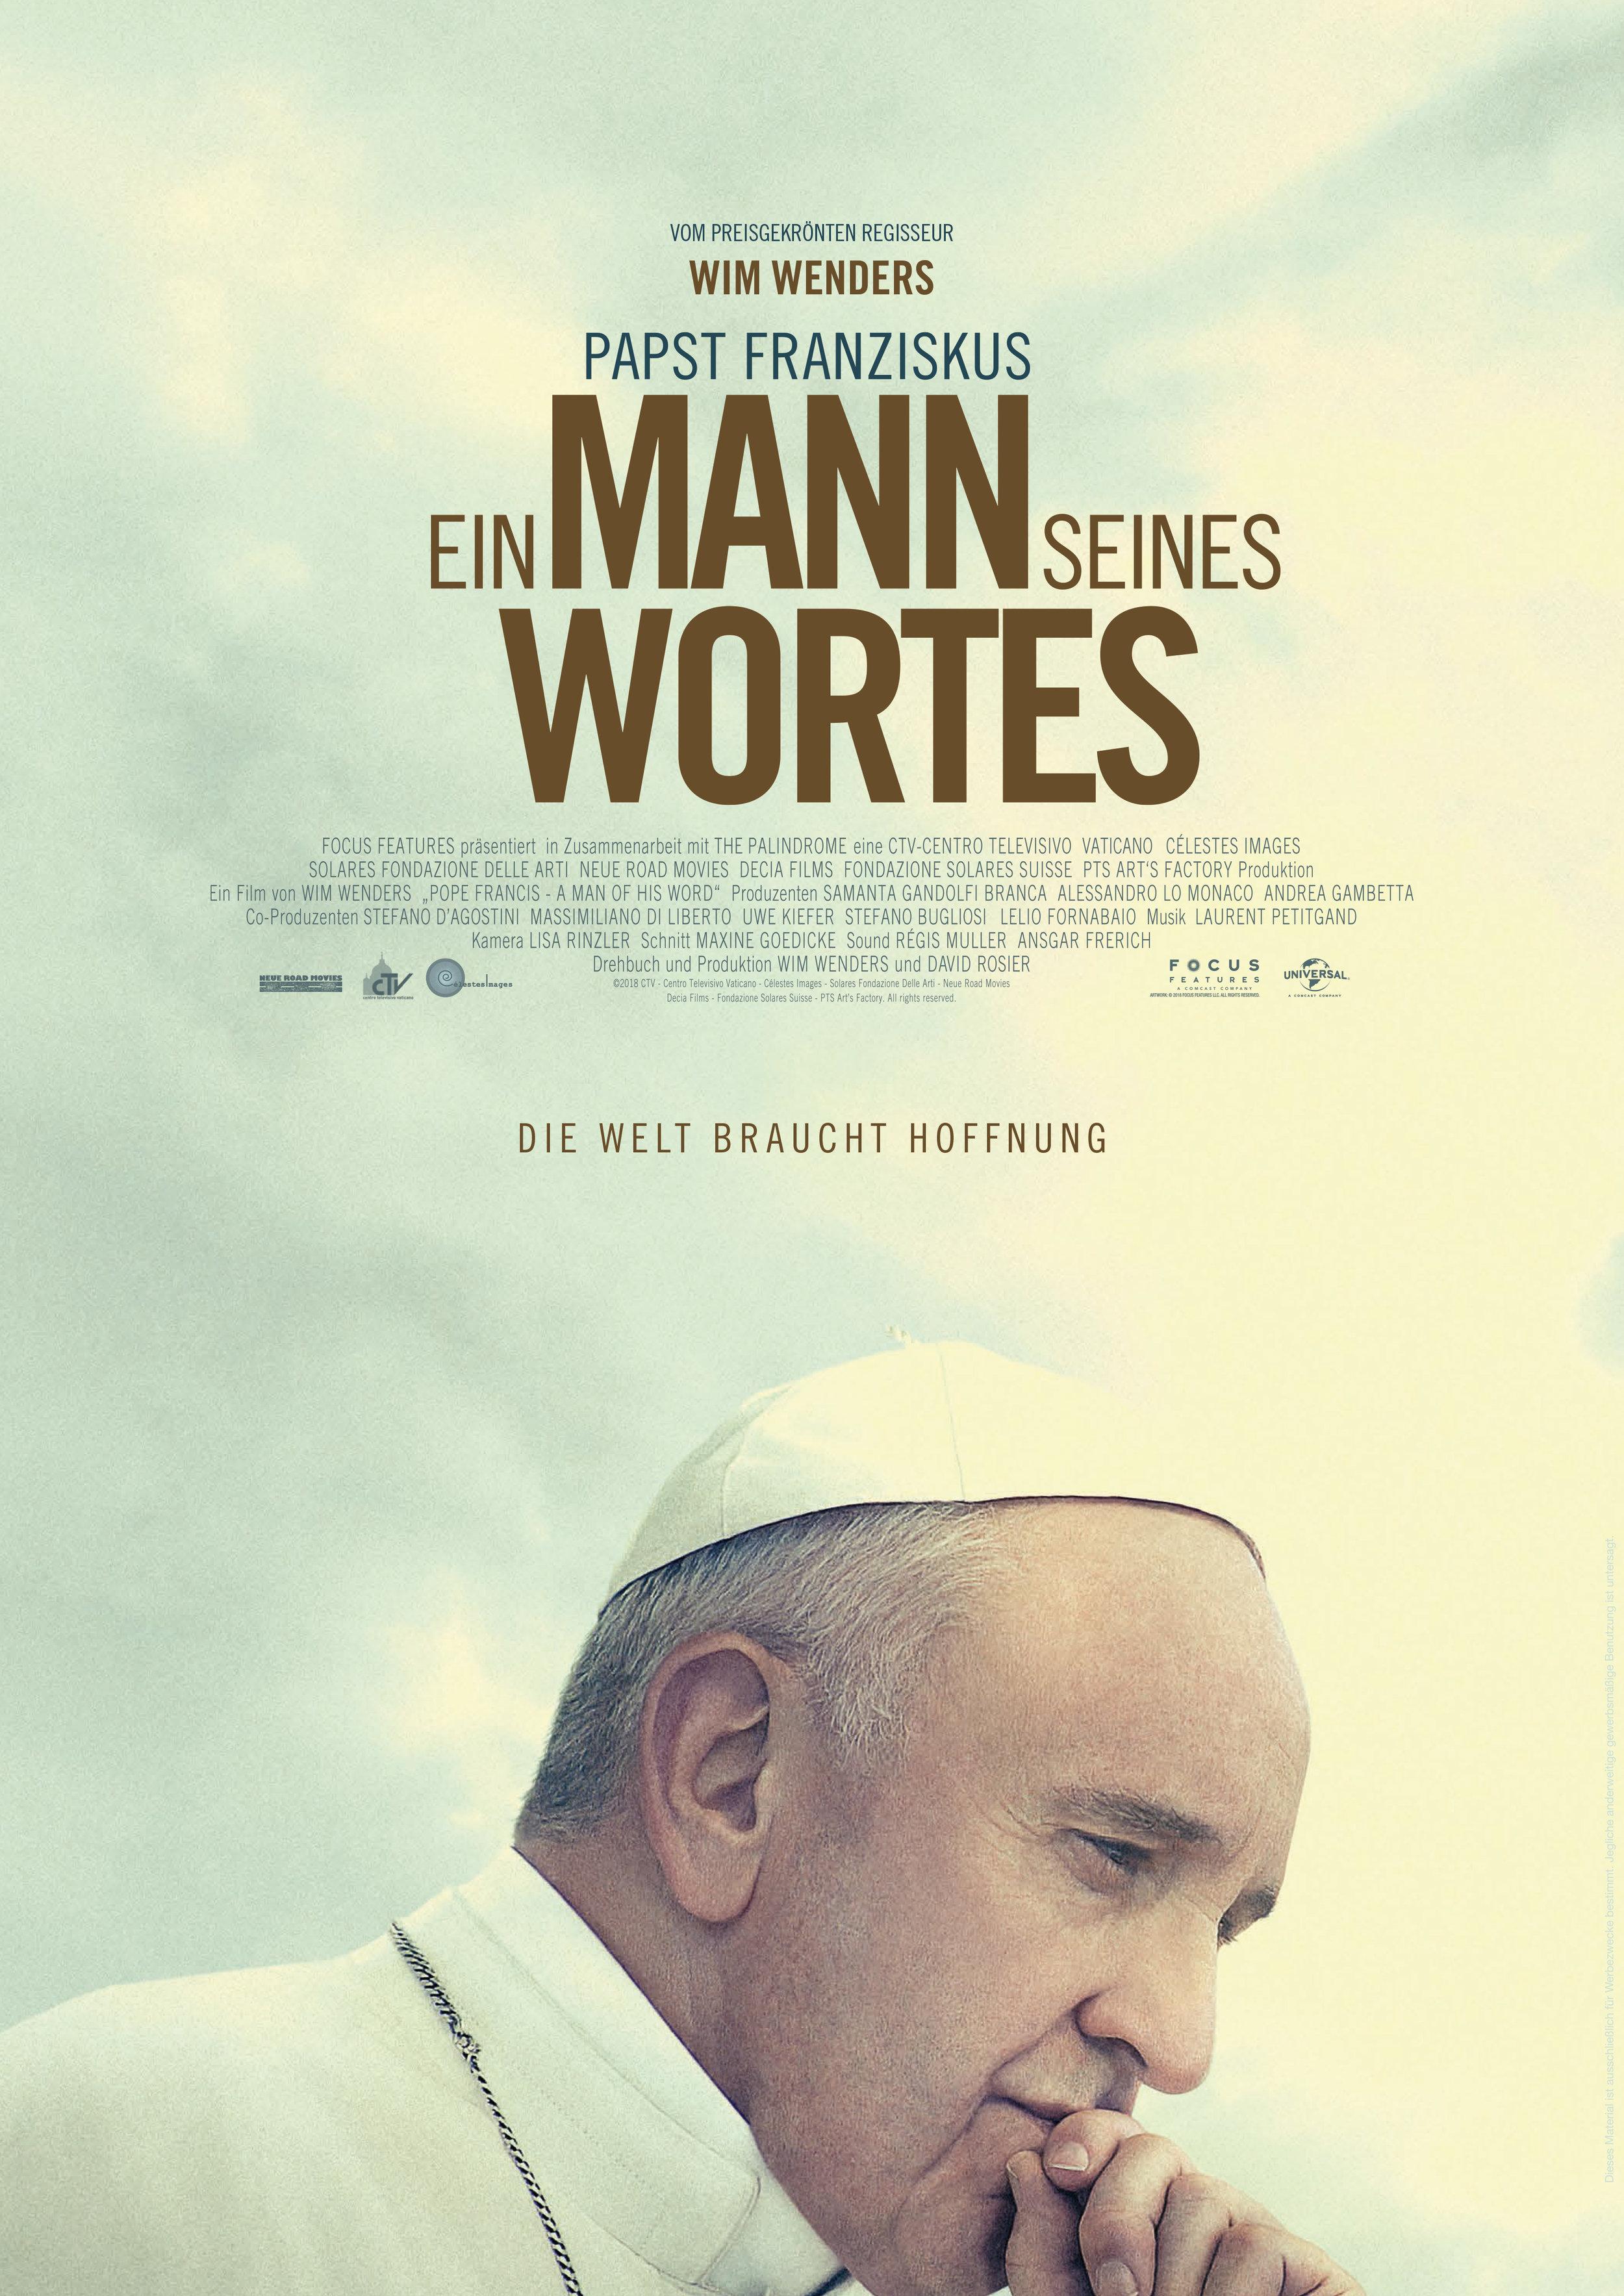 PapstFranziskus-dt2_01.jpg